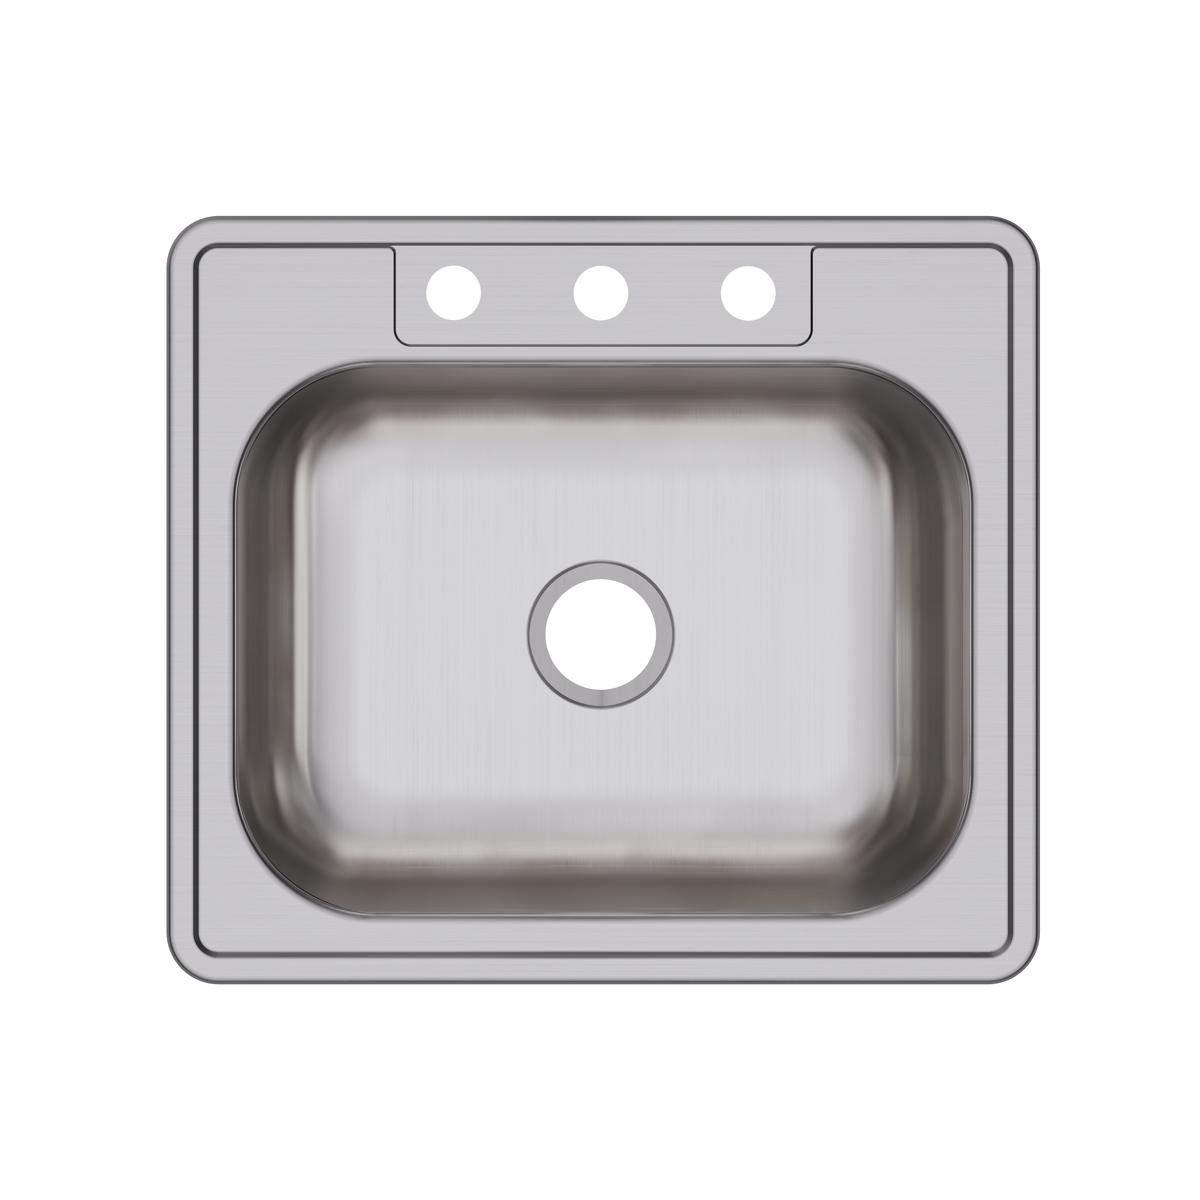 Dayton D125223 Single Bowl Top Mount Stainless Steel Sink by Elkay